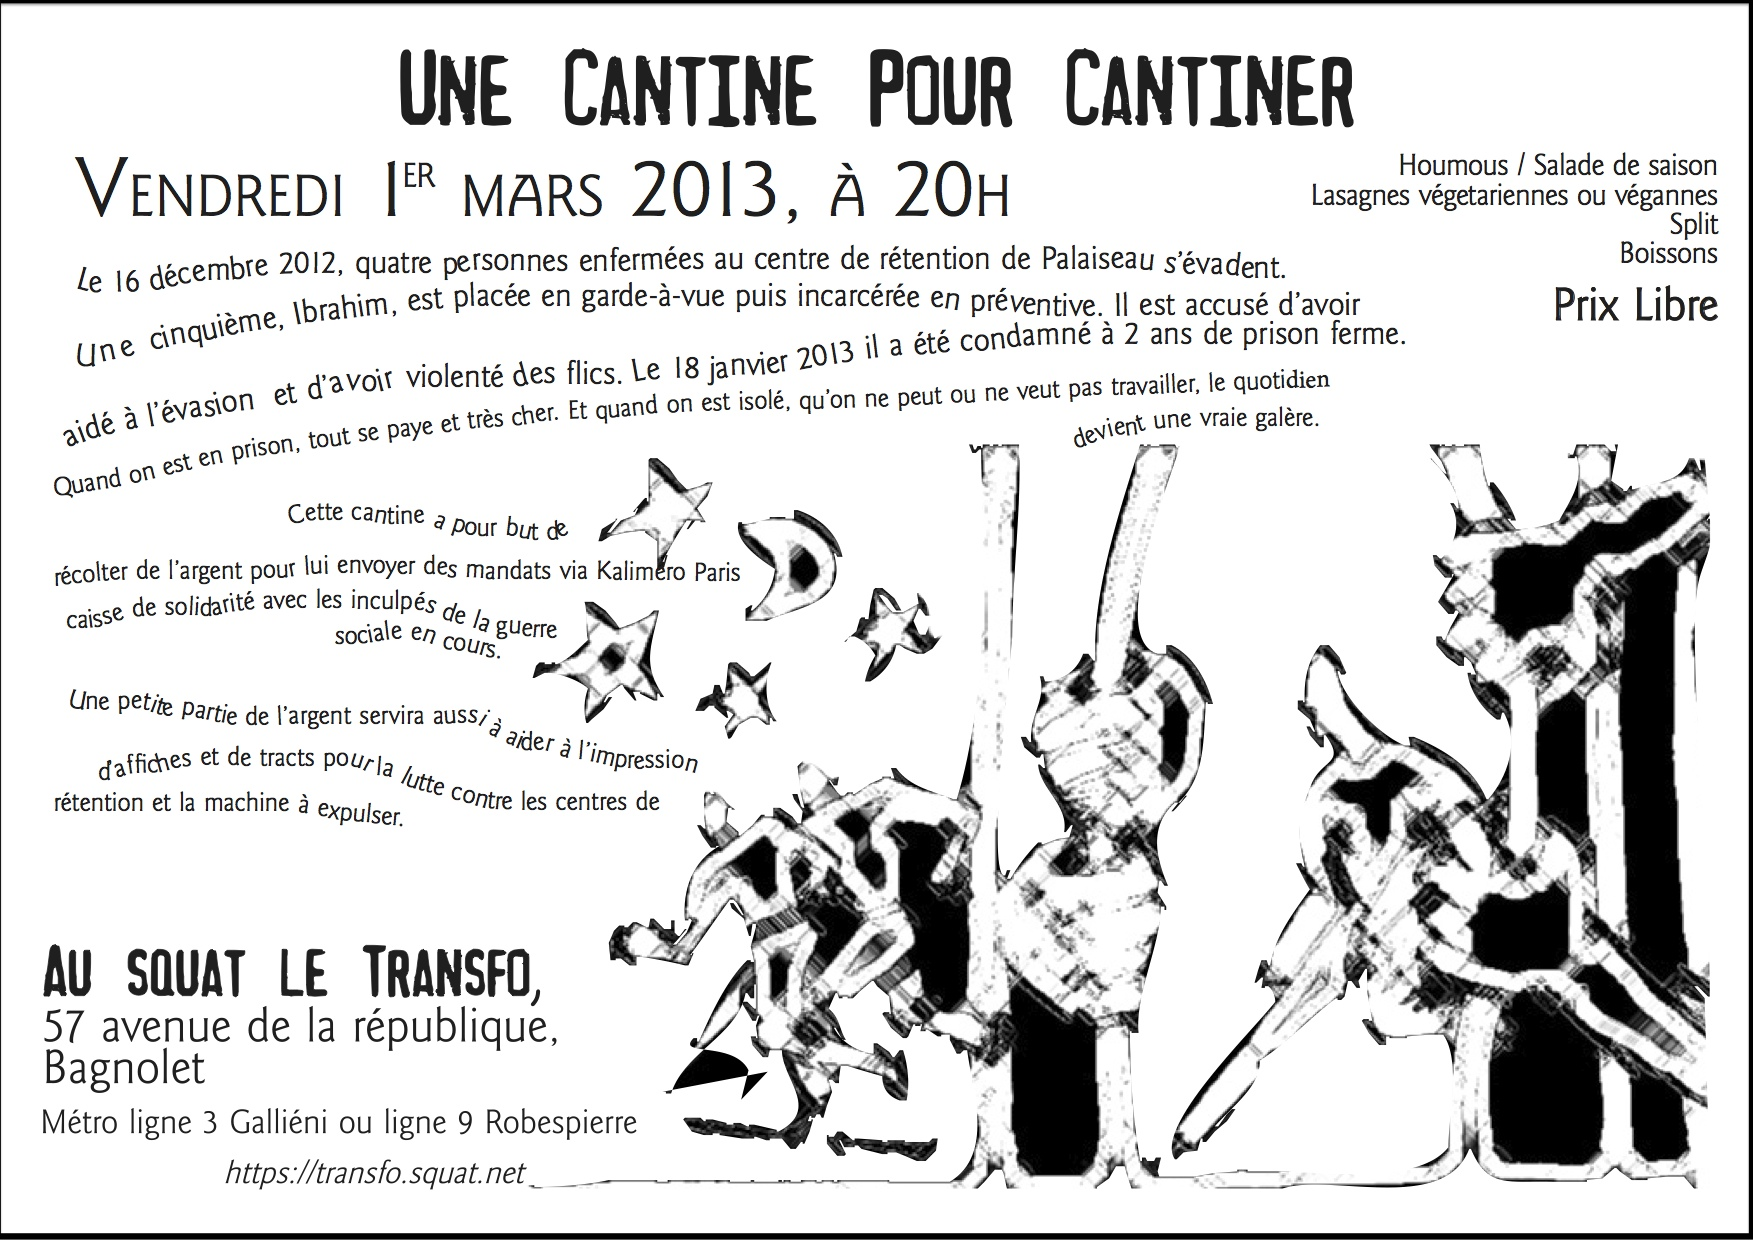 affiche-cantine-1ermars13